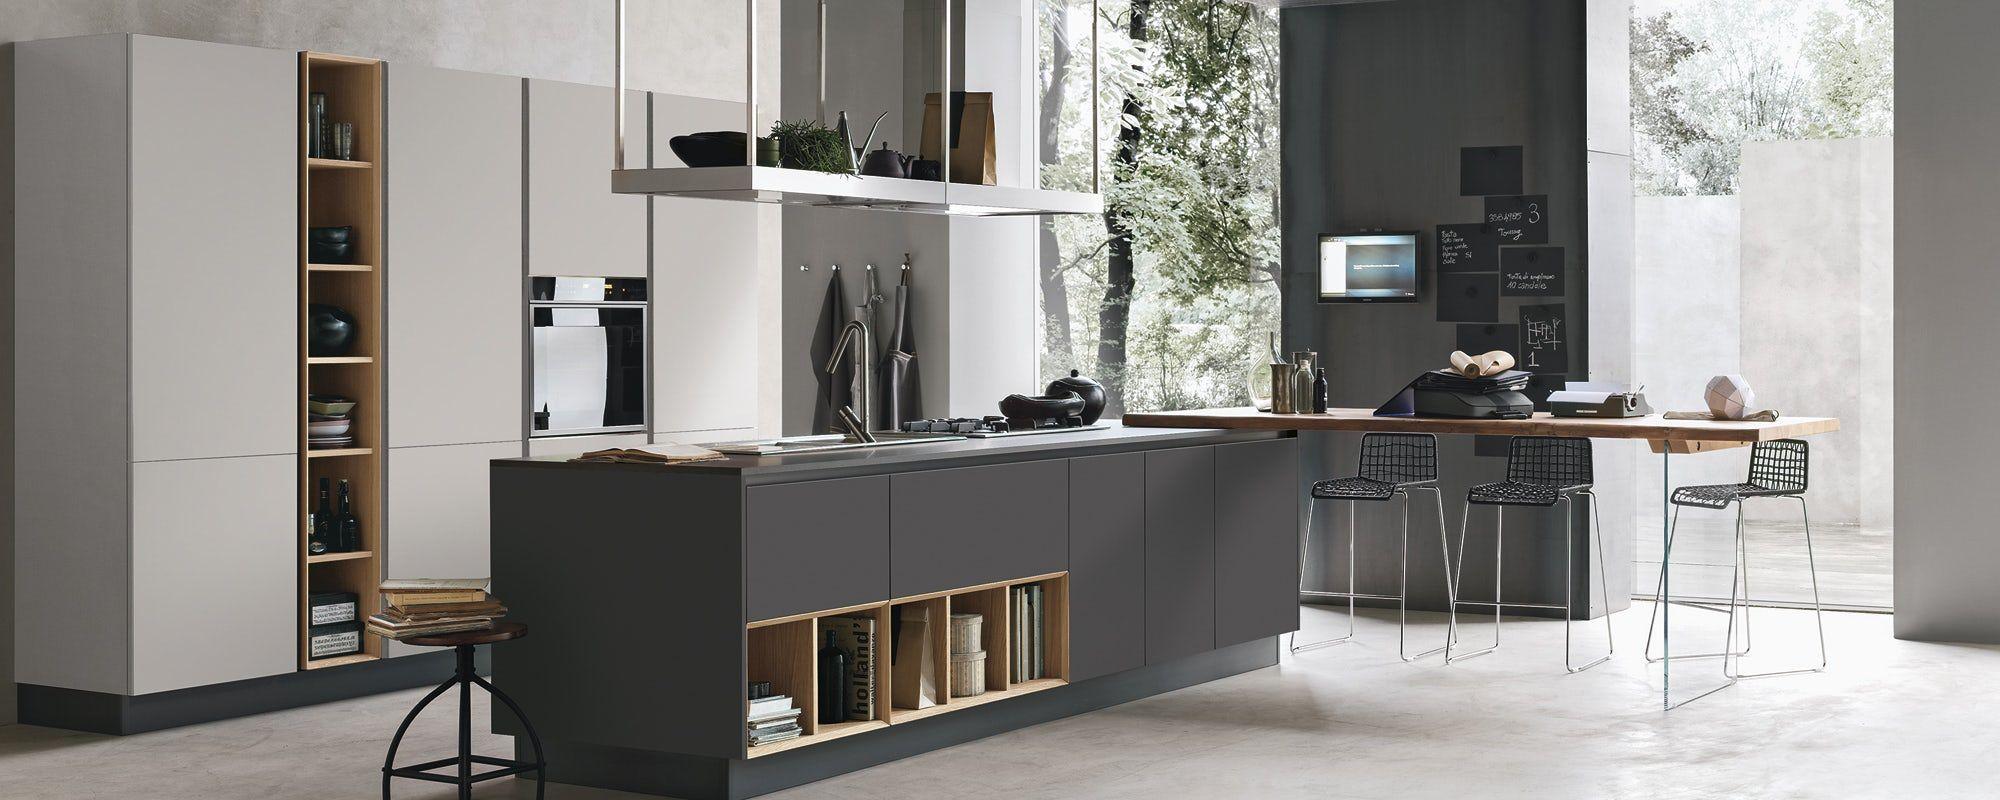 cucine moderne stosa - modello cucina maya 14 | Kitchen | Home Decor ...